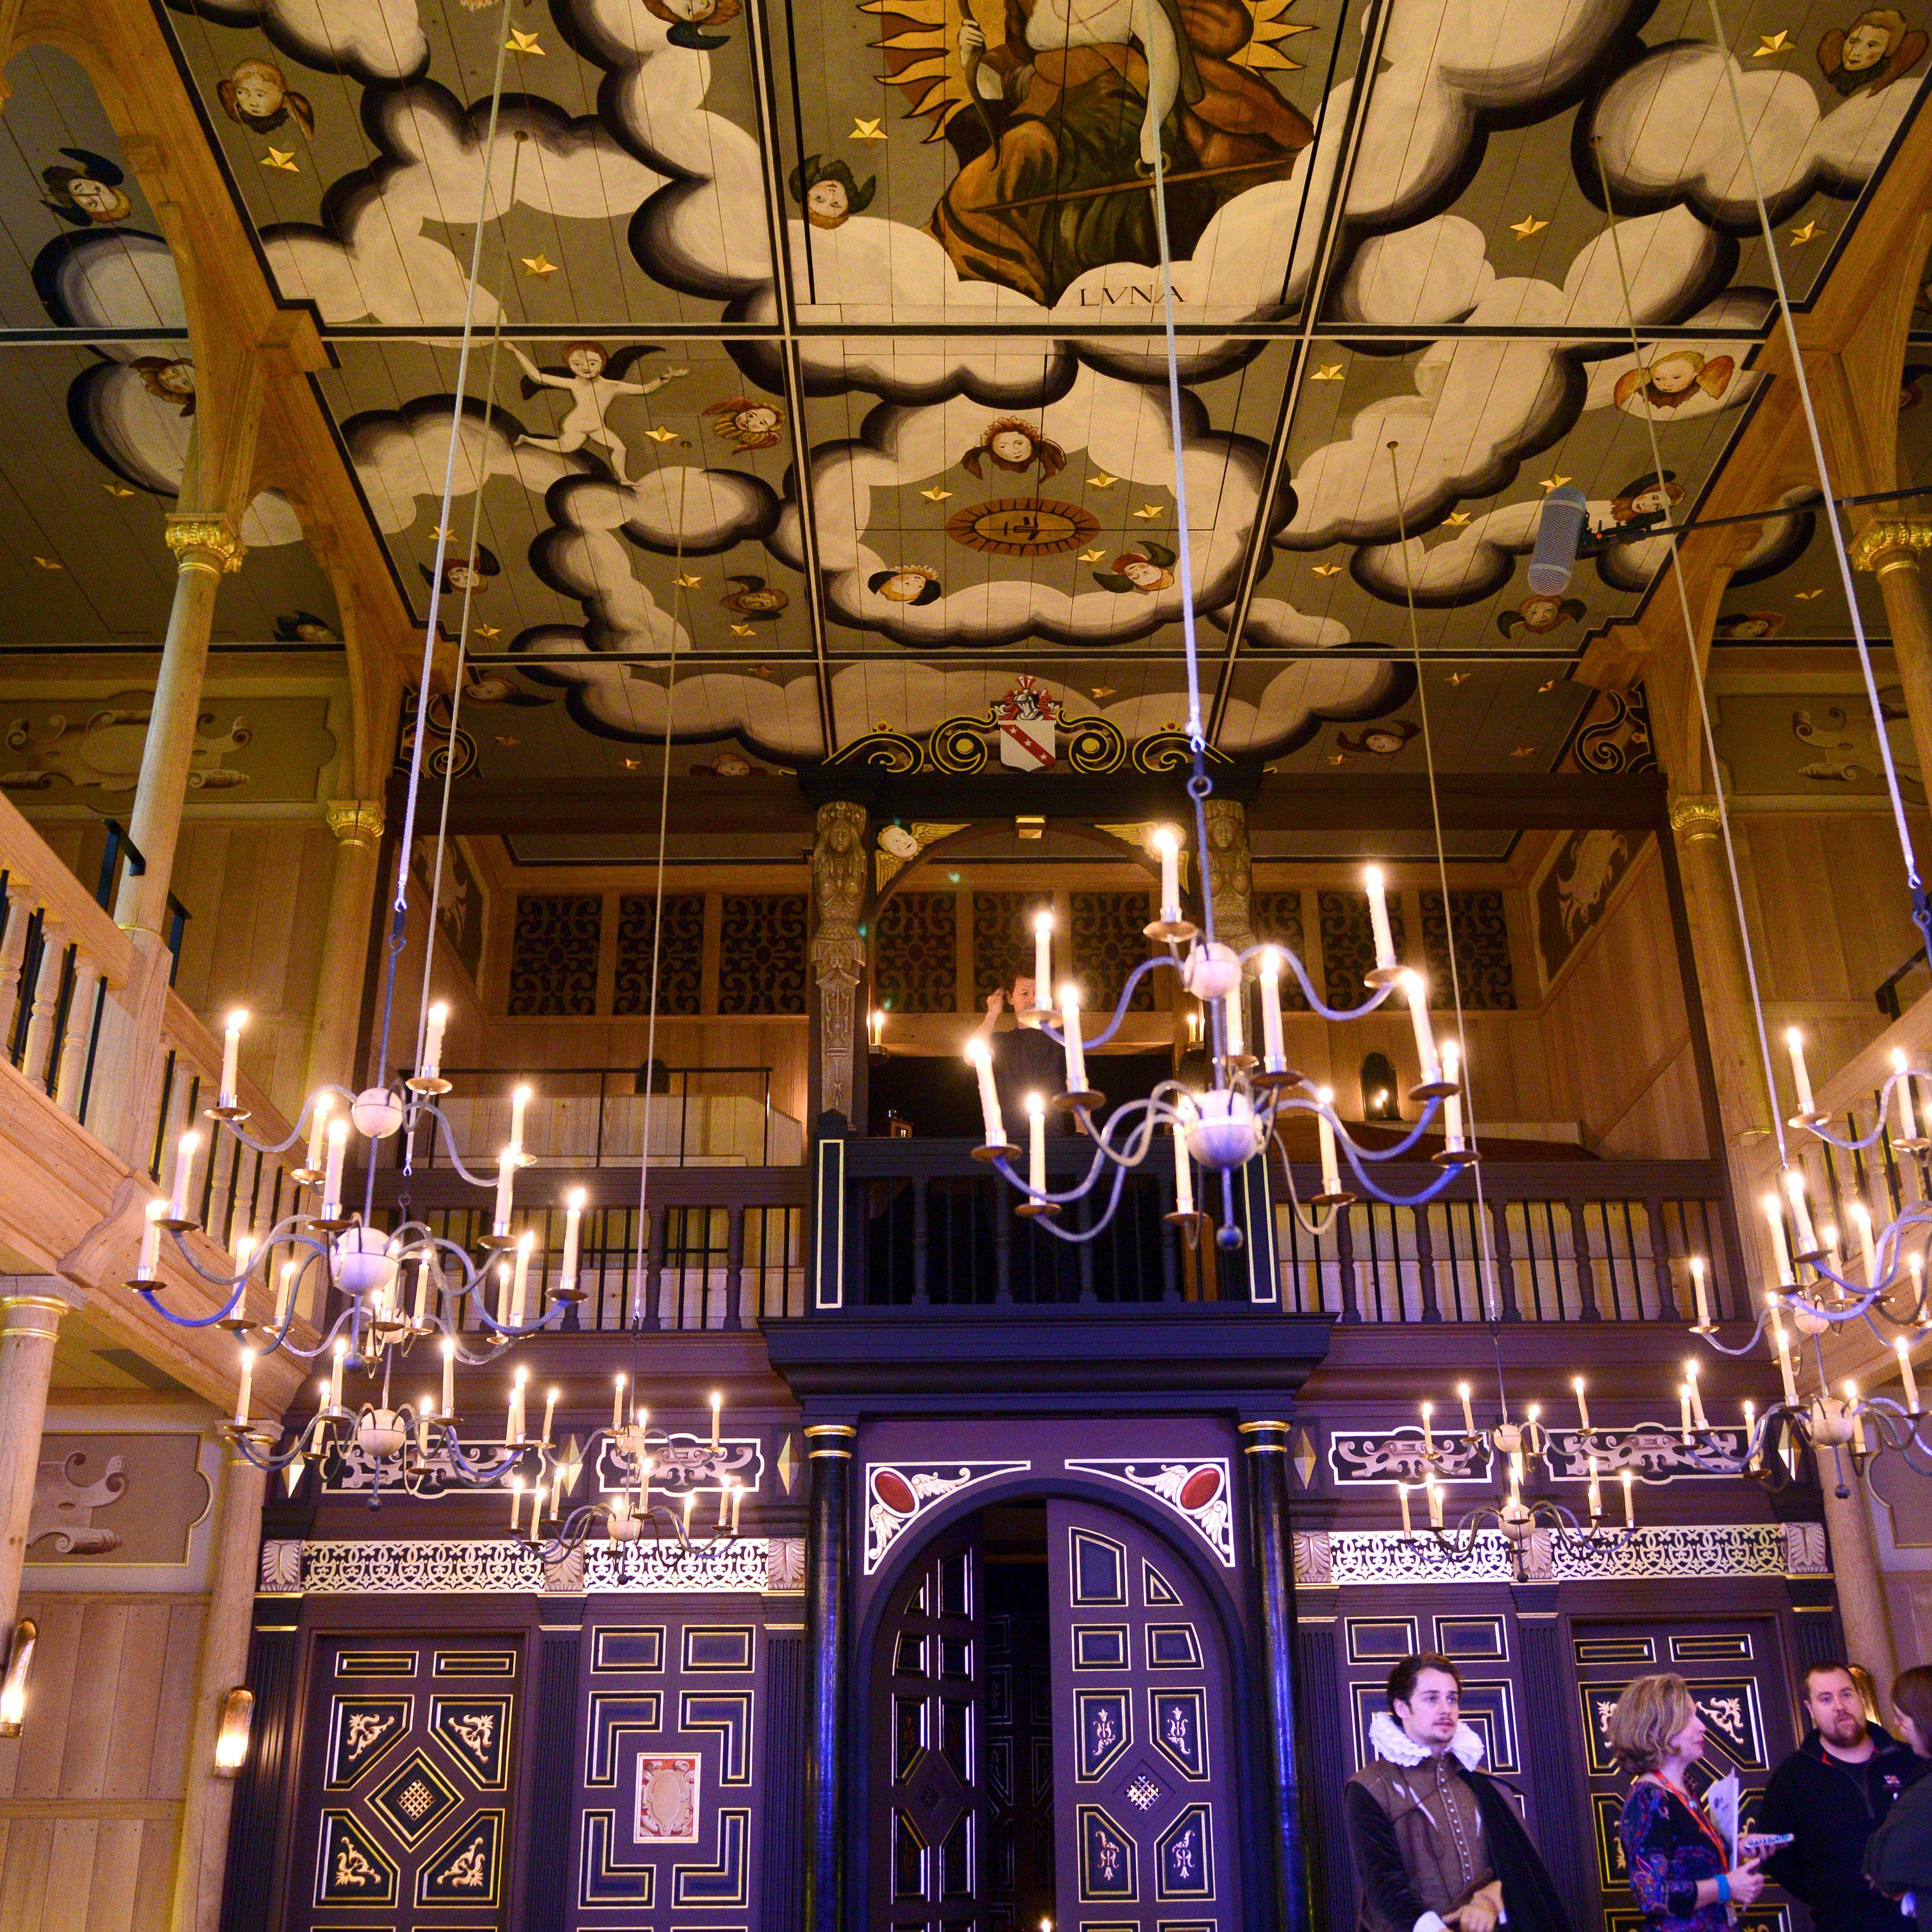 Interior of the Sam Wanamaker Theater at Shakespeare's Globe in London